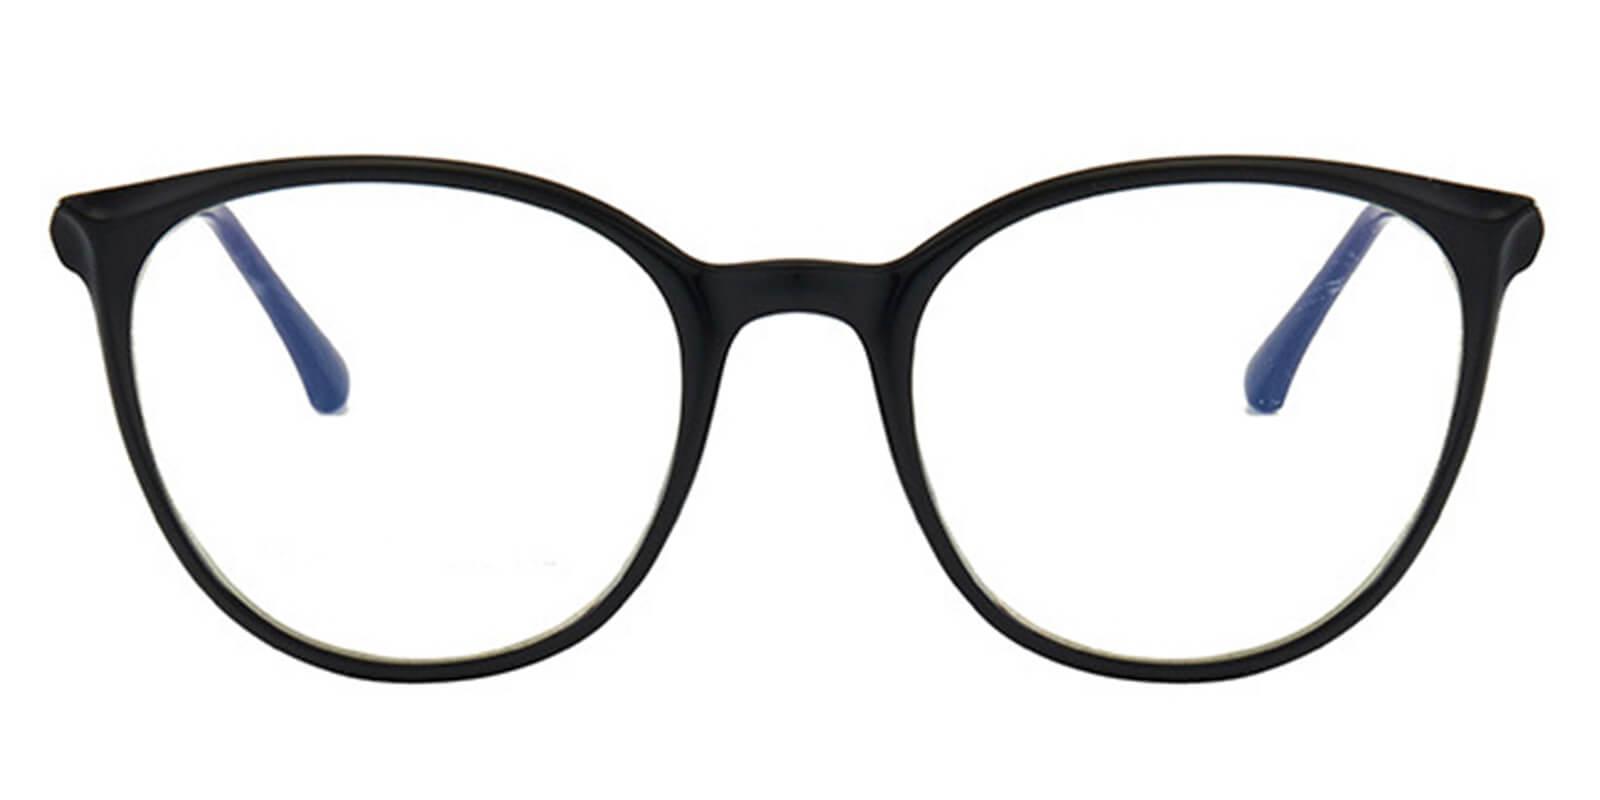 Larkk-Black Women Cat Eye Glasses with Metal Temples